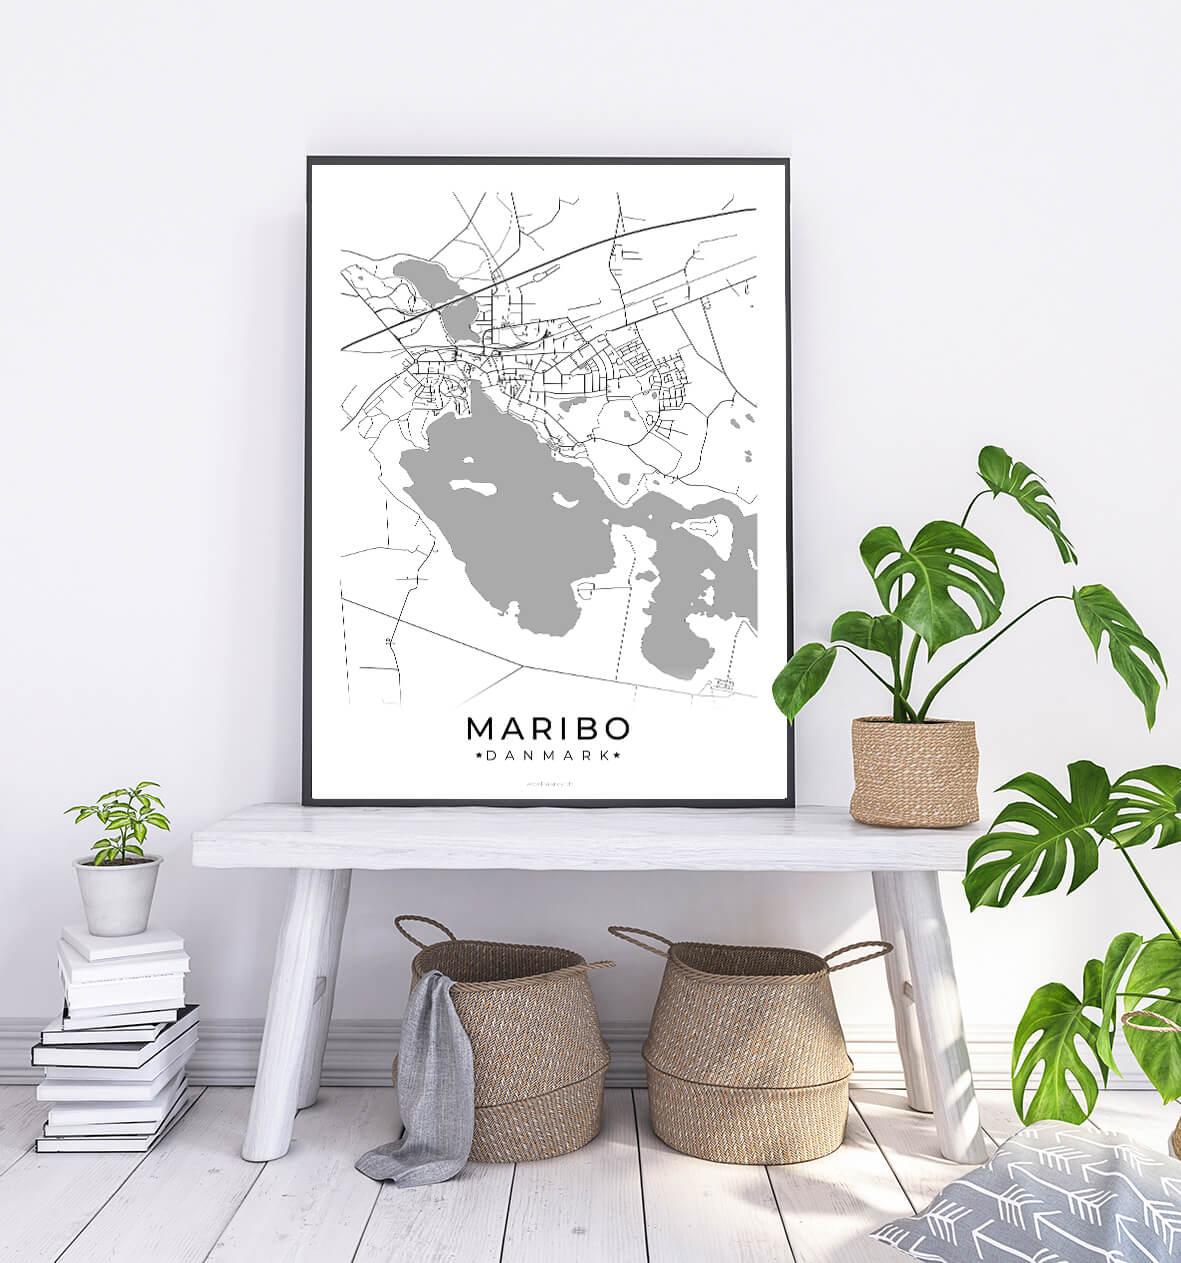 Maribo-hvid-byplakat-1